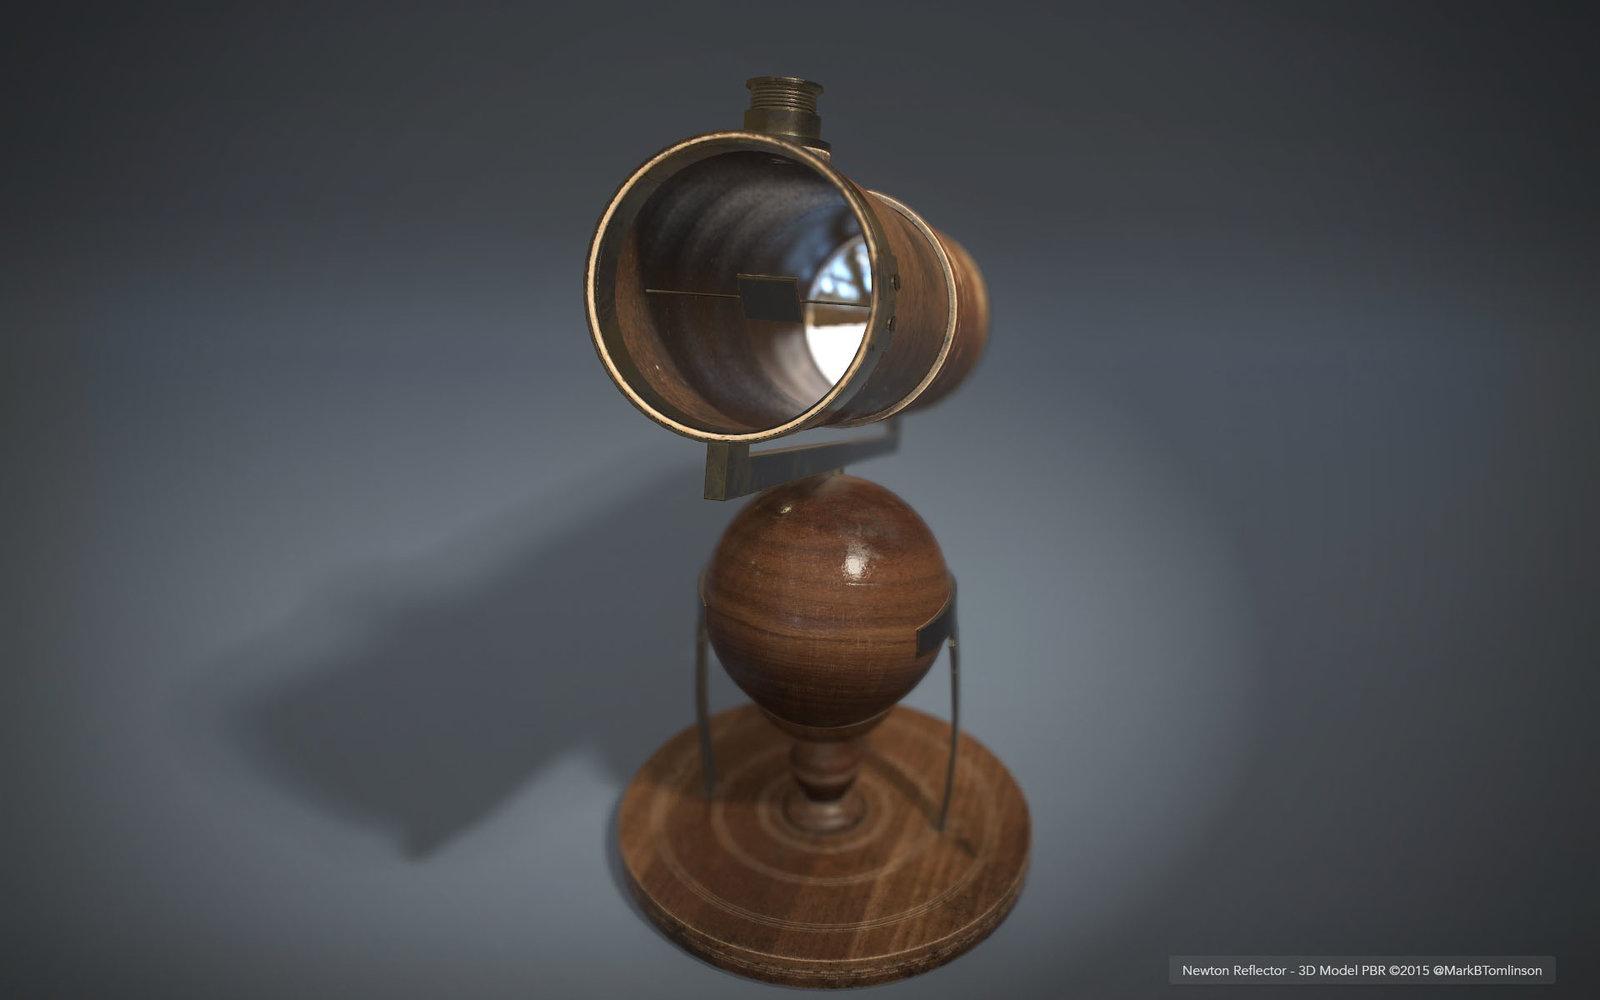 Newton Reflector PBR